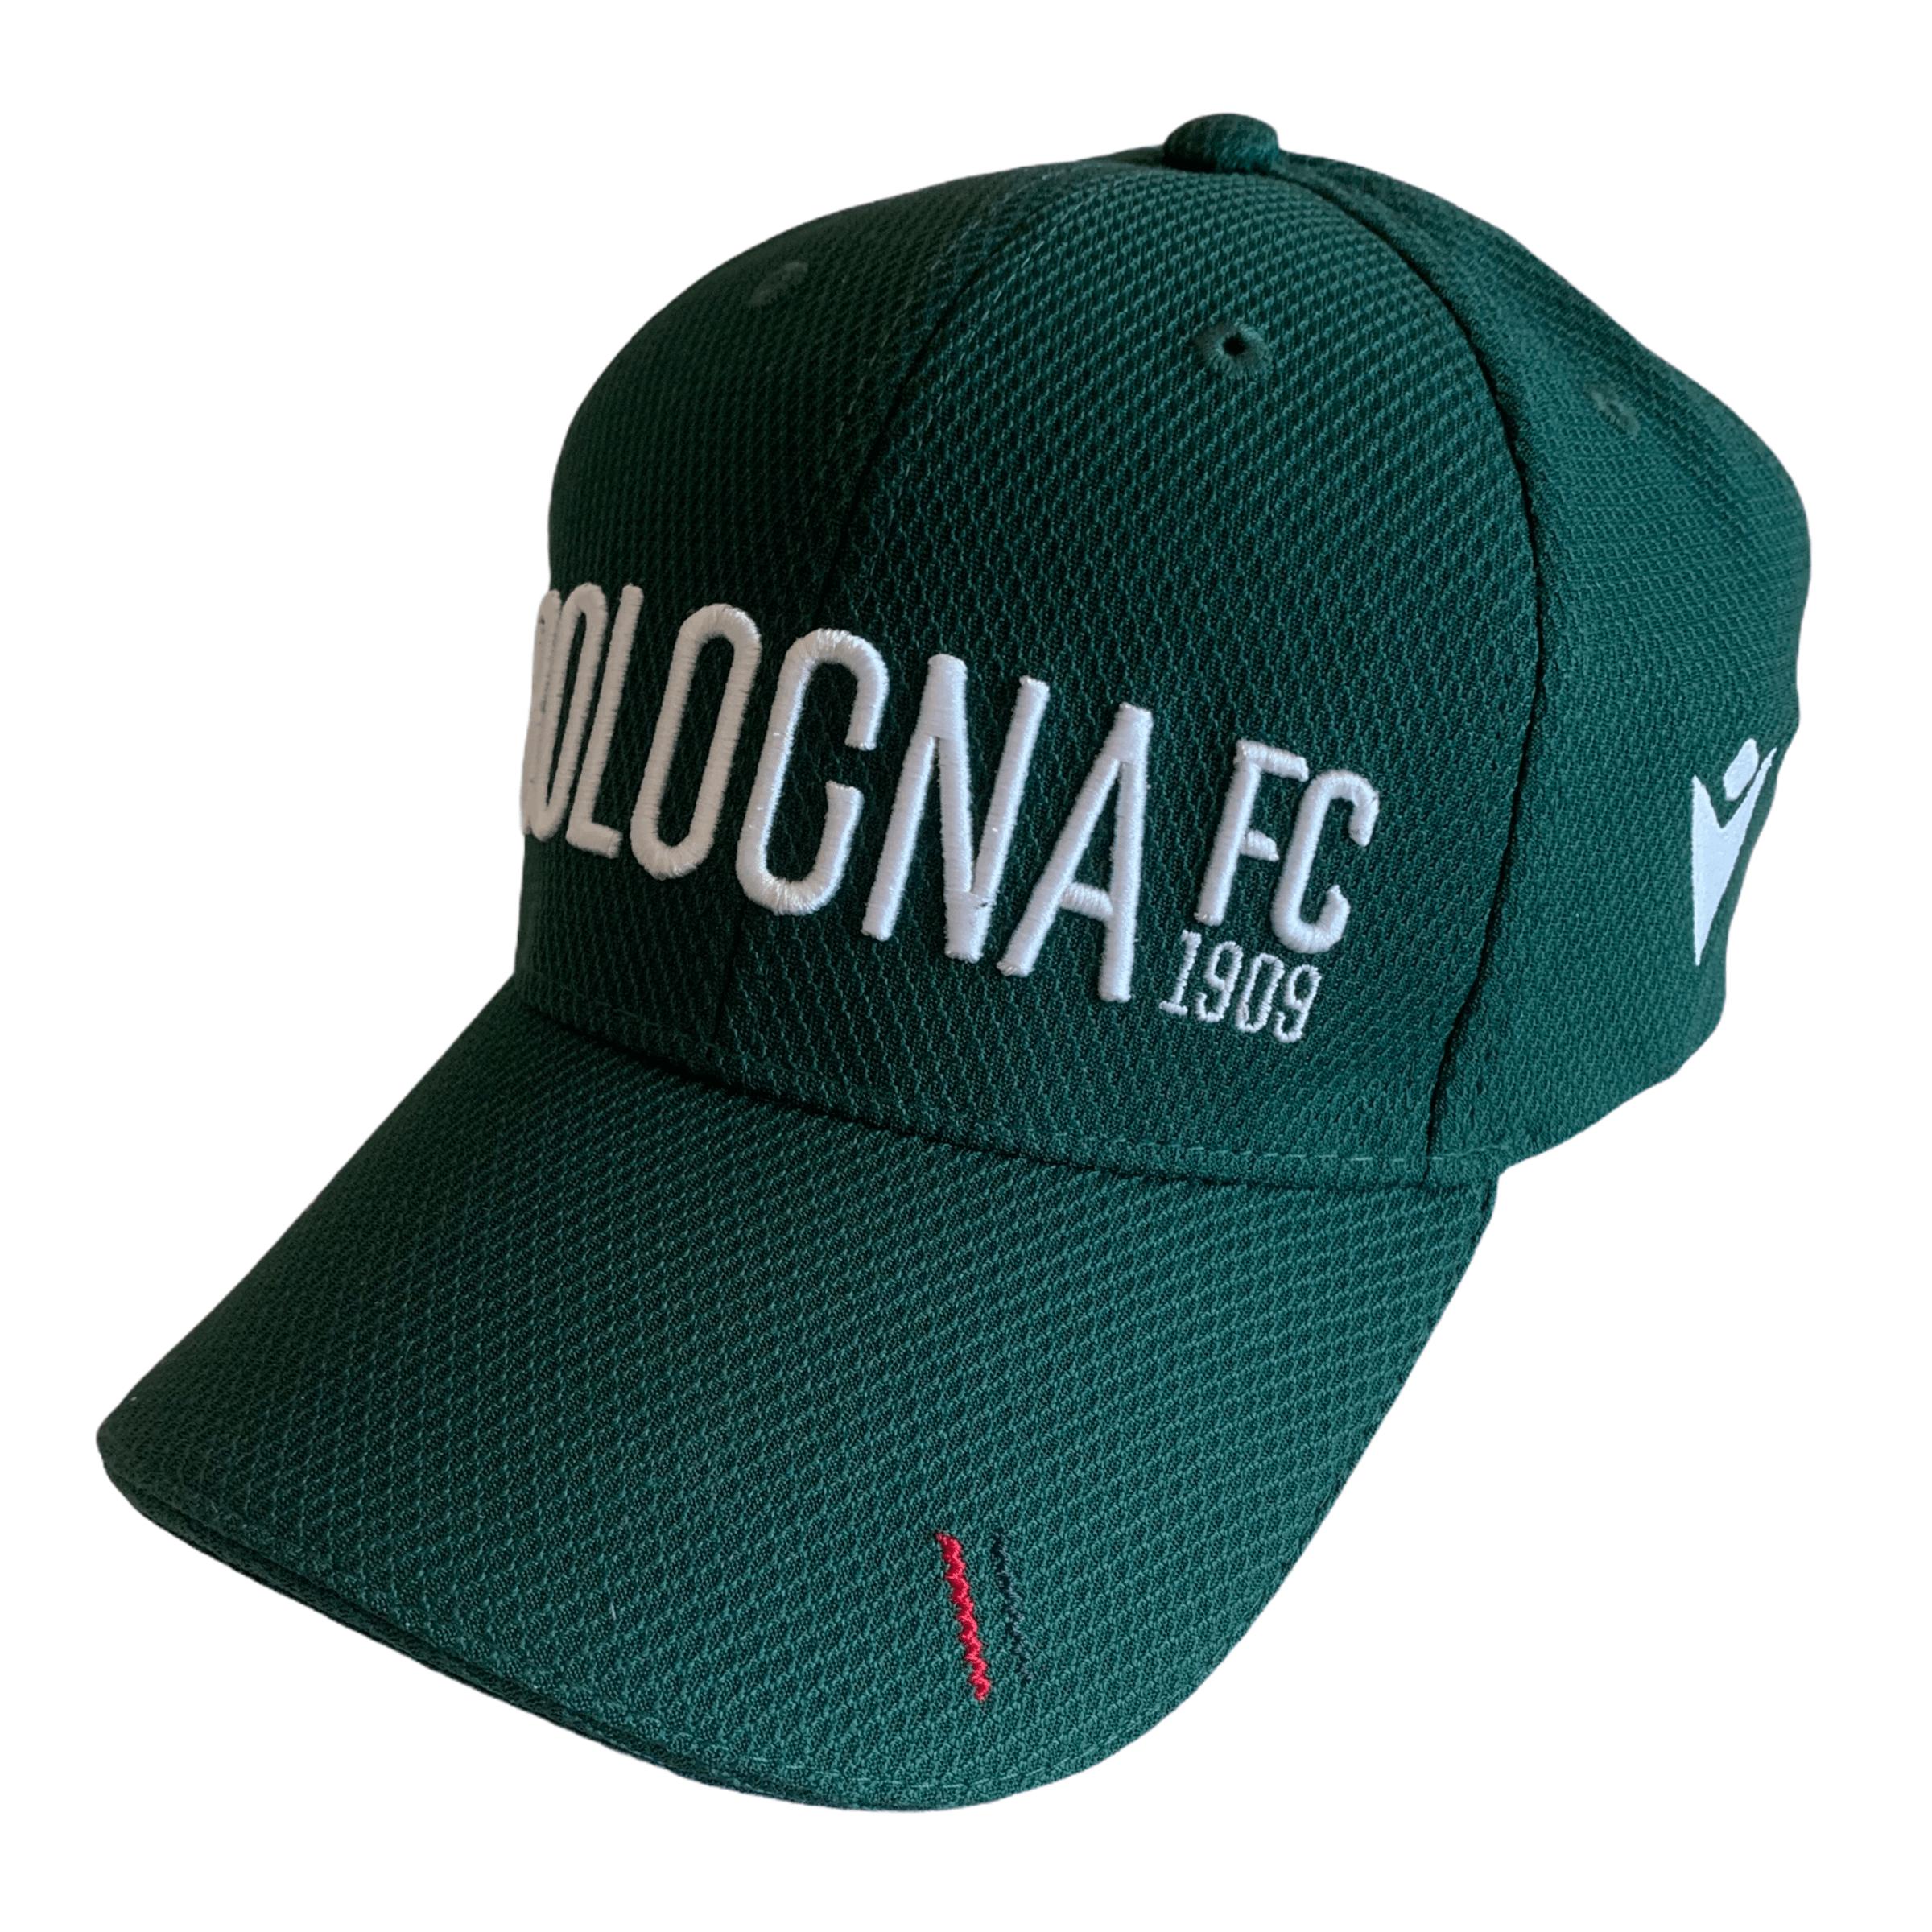 CAP MACRON 2021/22 (Adulto) Bologna Fc